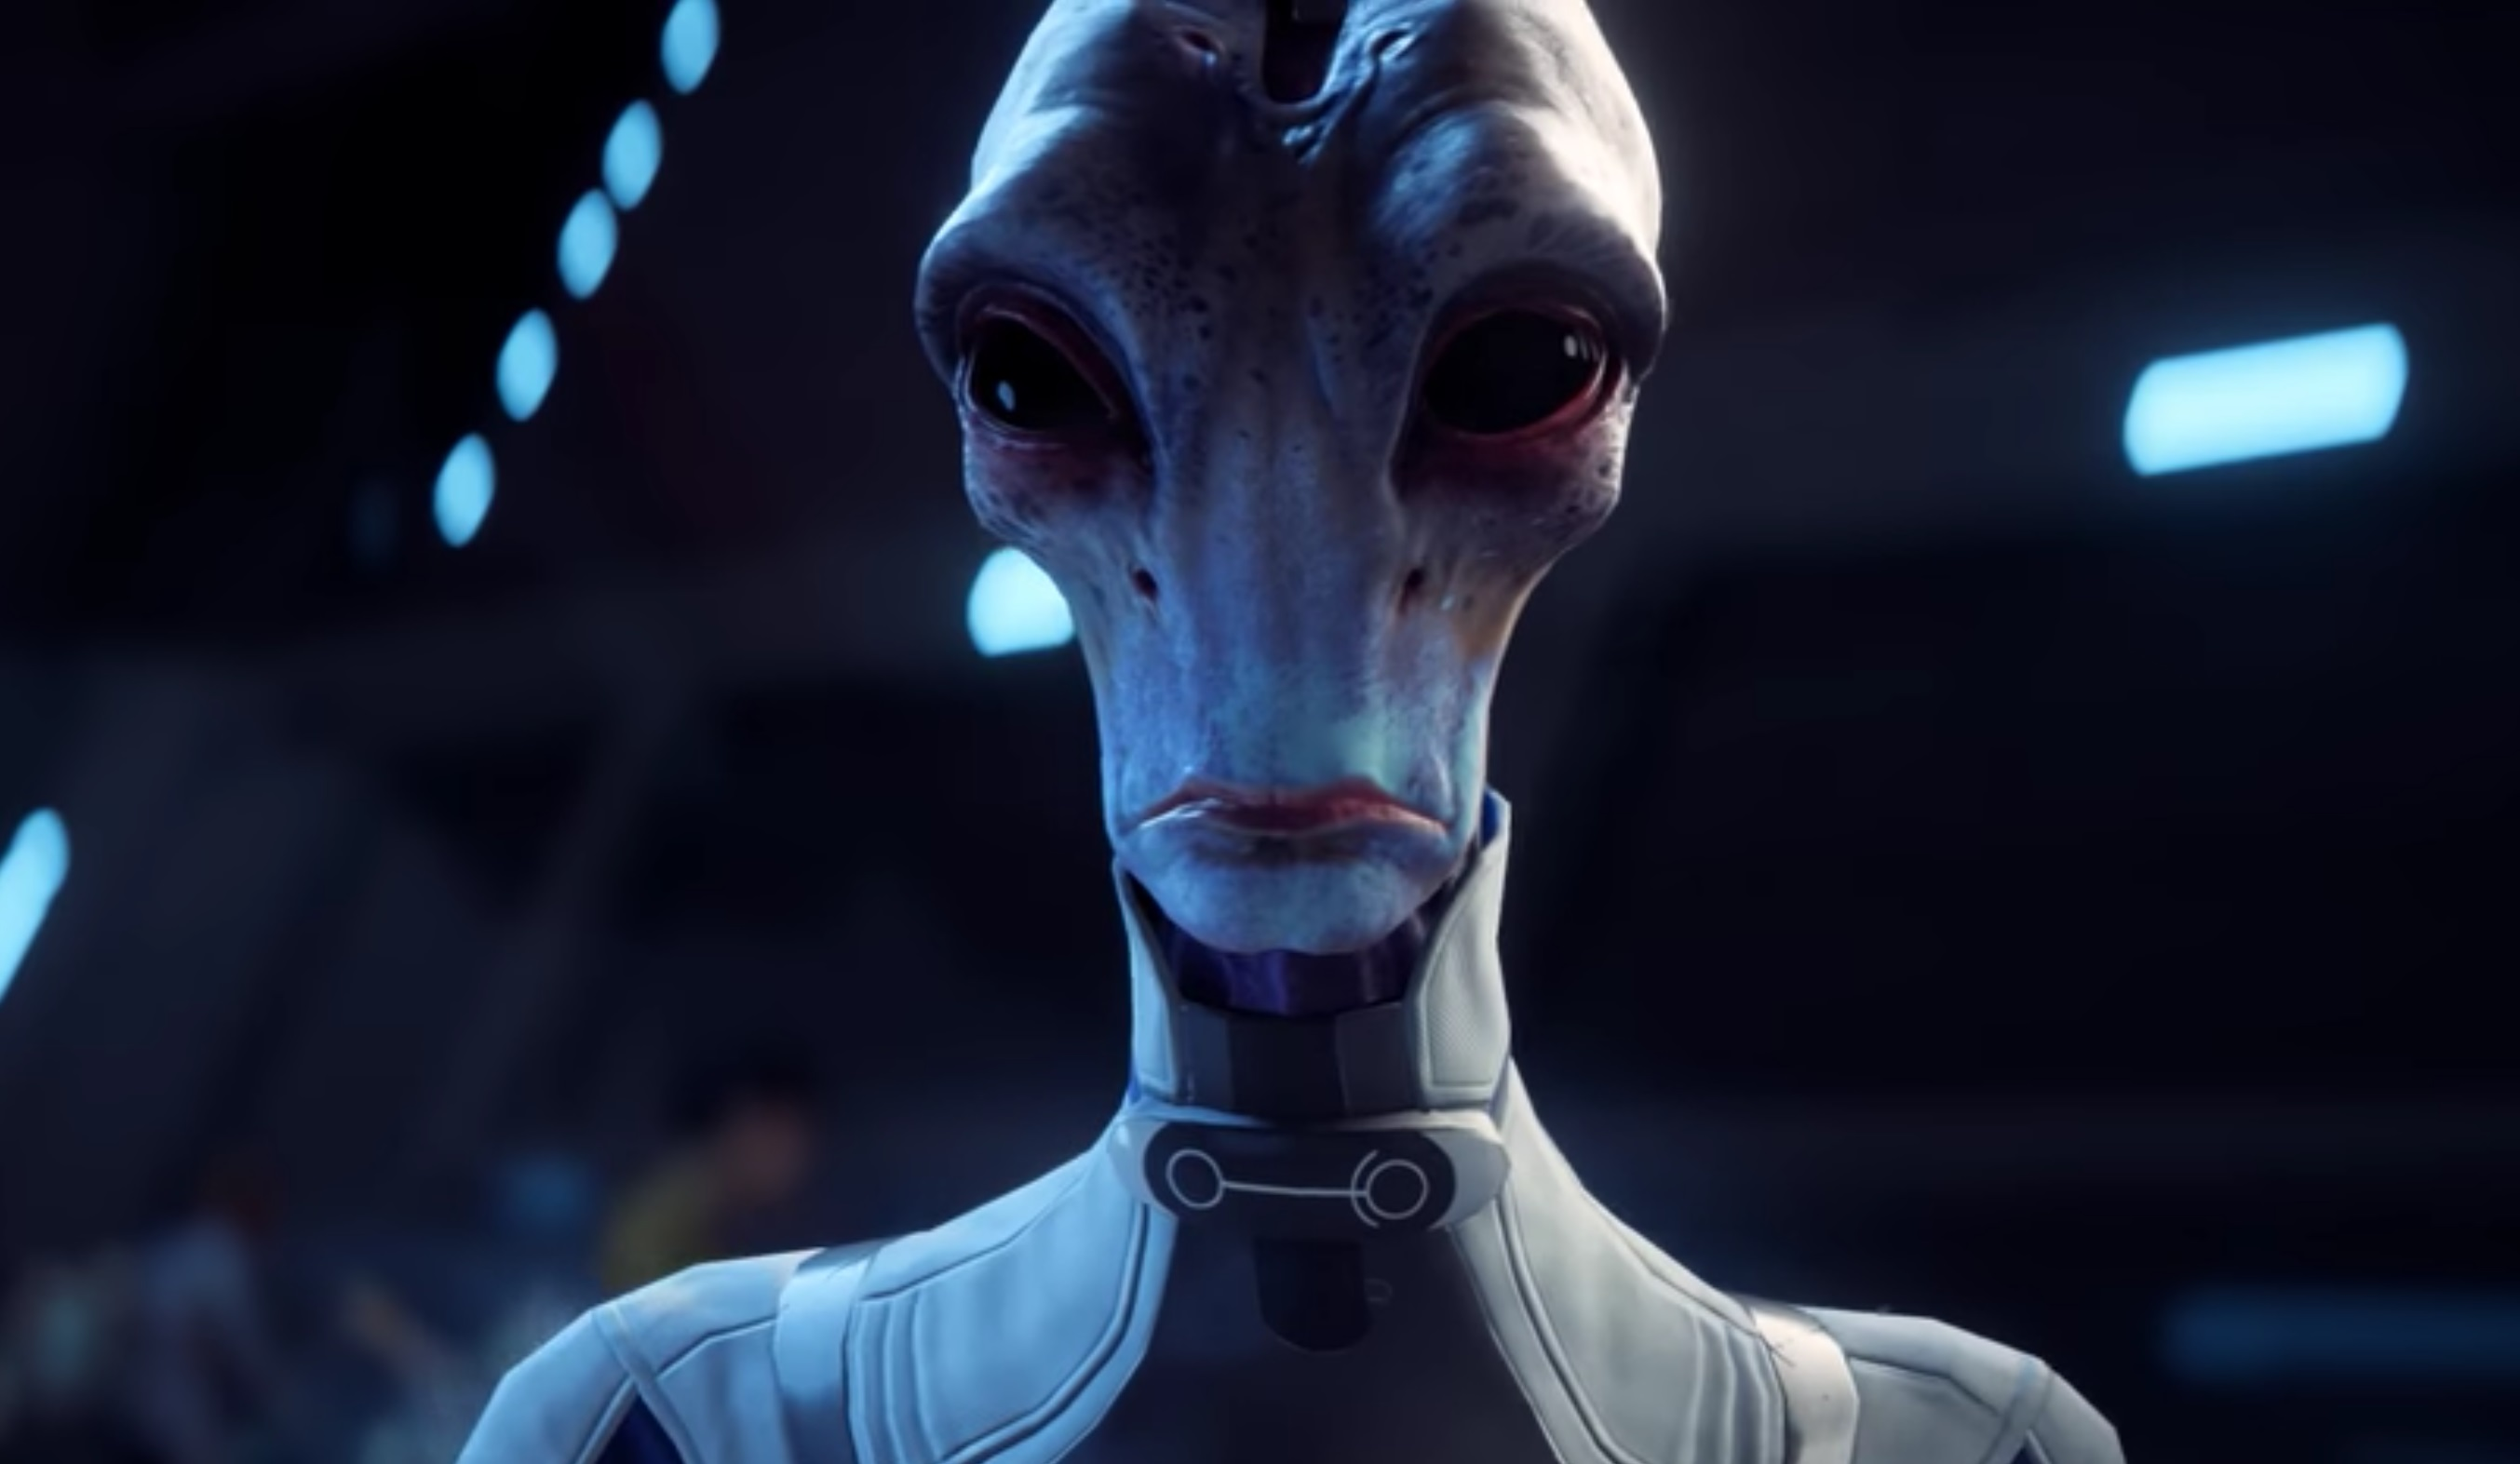 Mass Effect Andromeda Director Tann